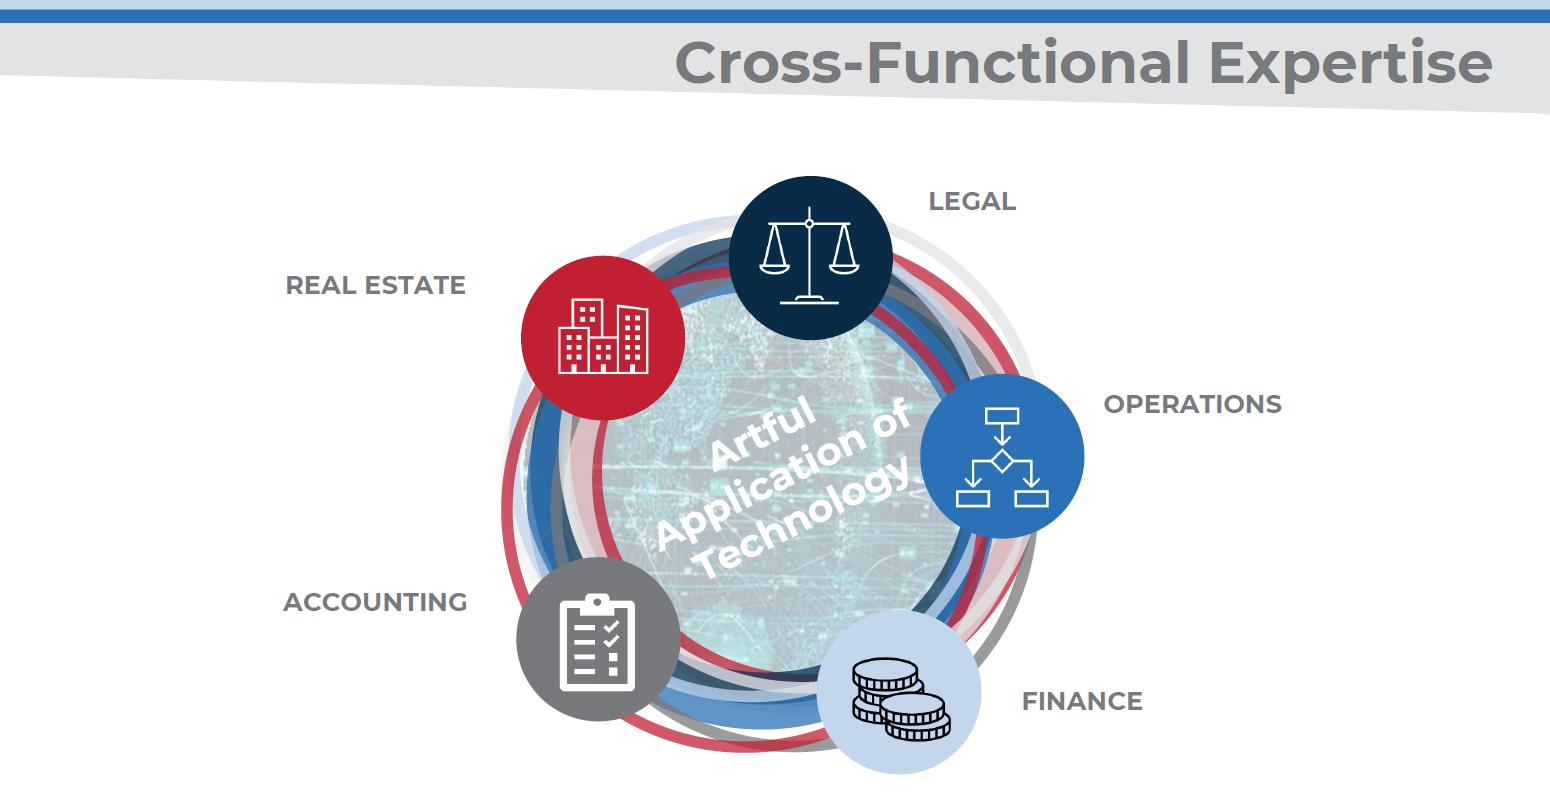 Cross Functional Expertise